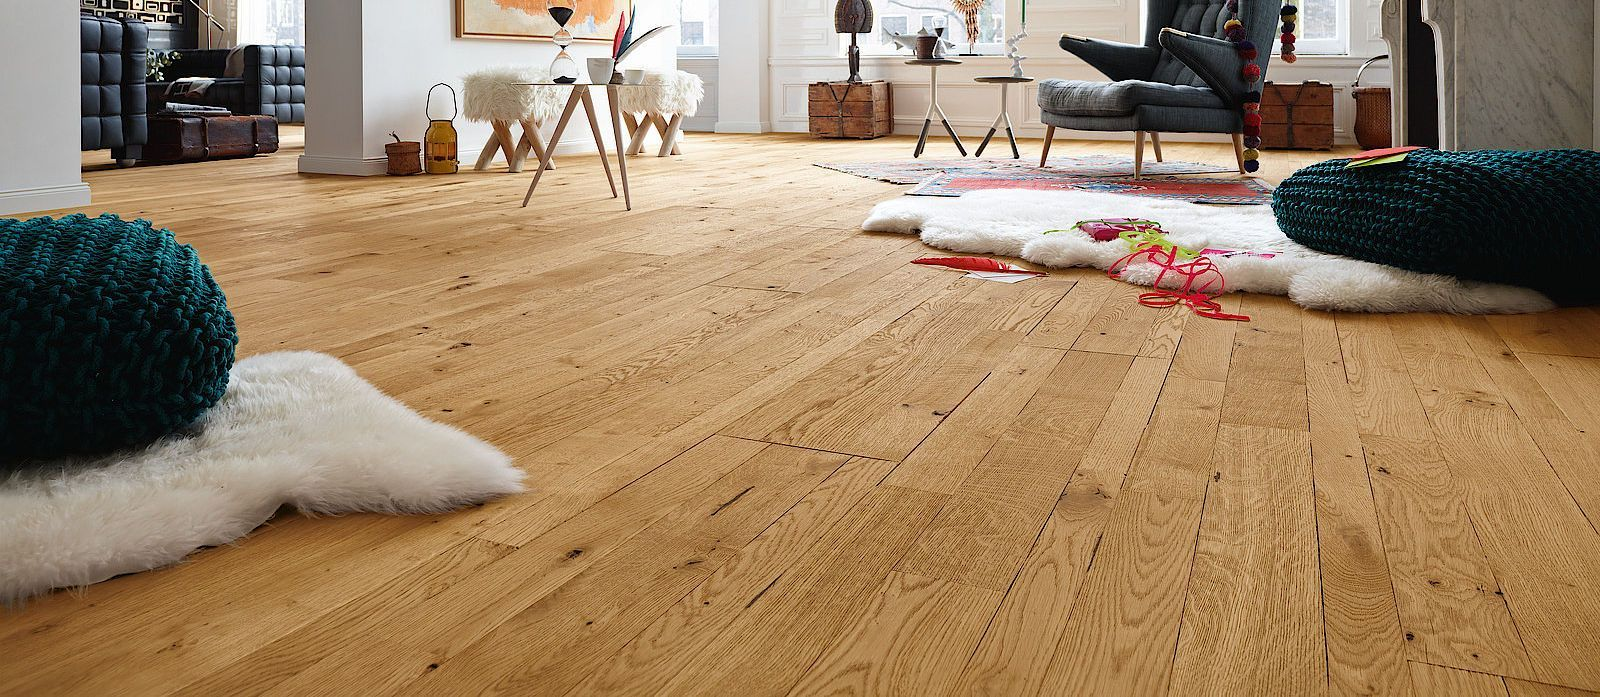 Buy water proof flooring dubai ,Abu Dhabi Across UAE